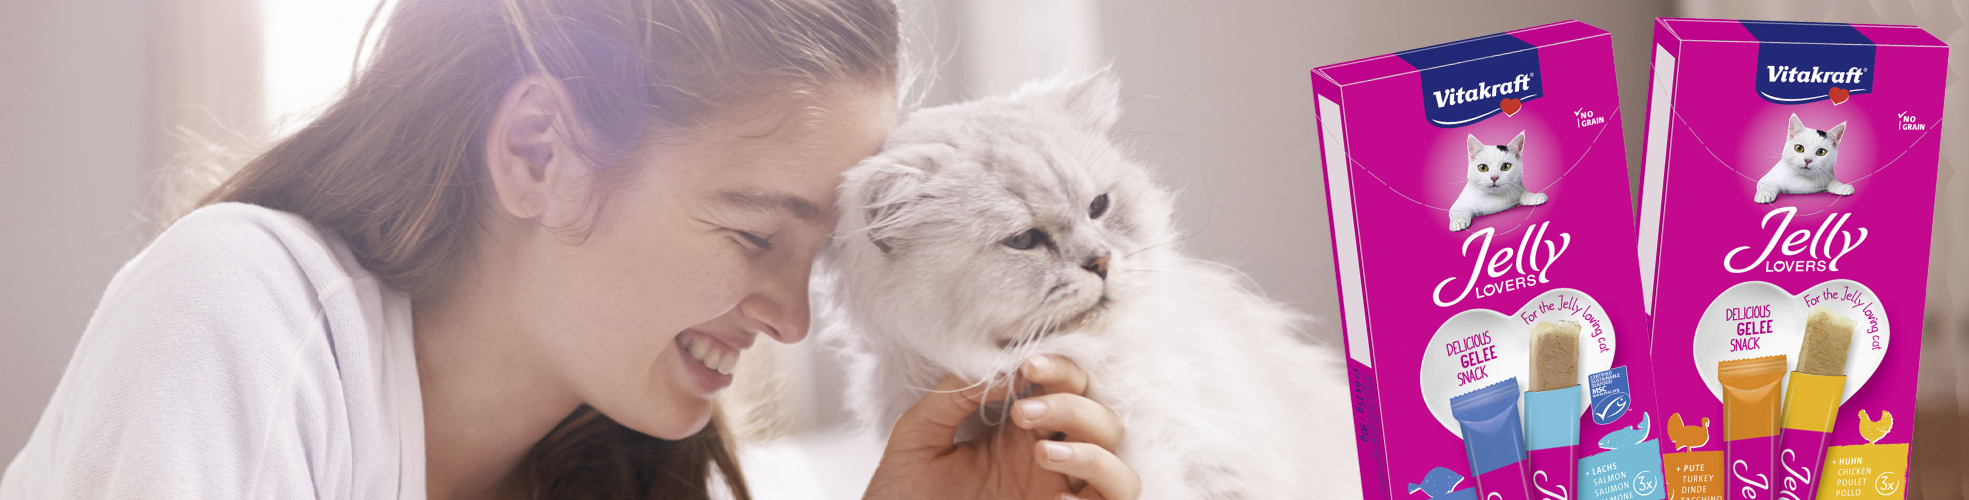 Frau mit Katze betrachtet Jelly Lovers